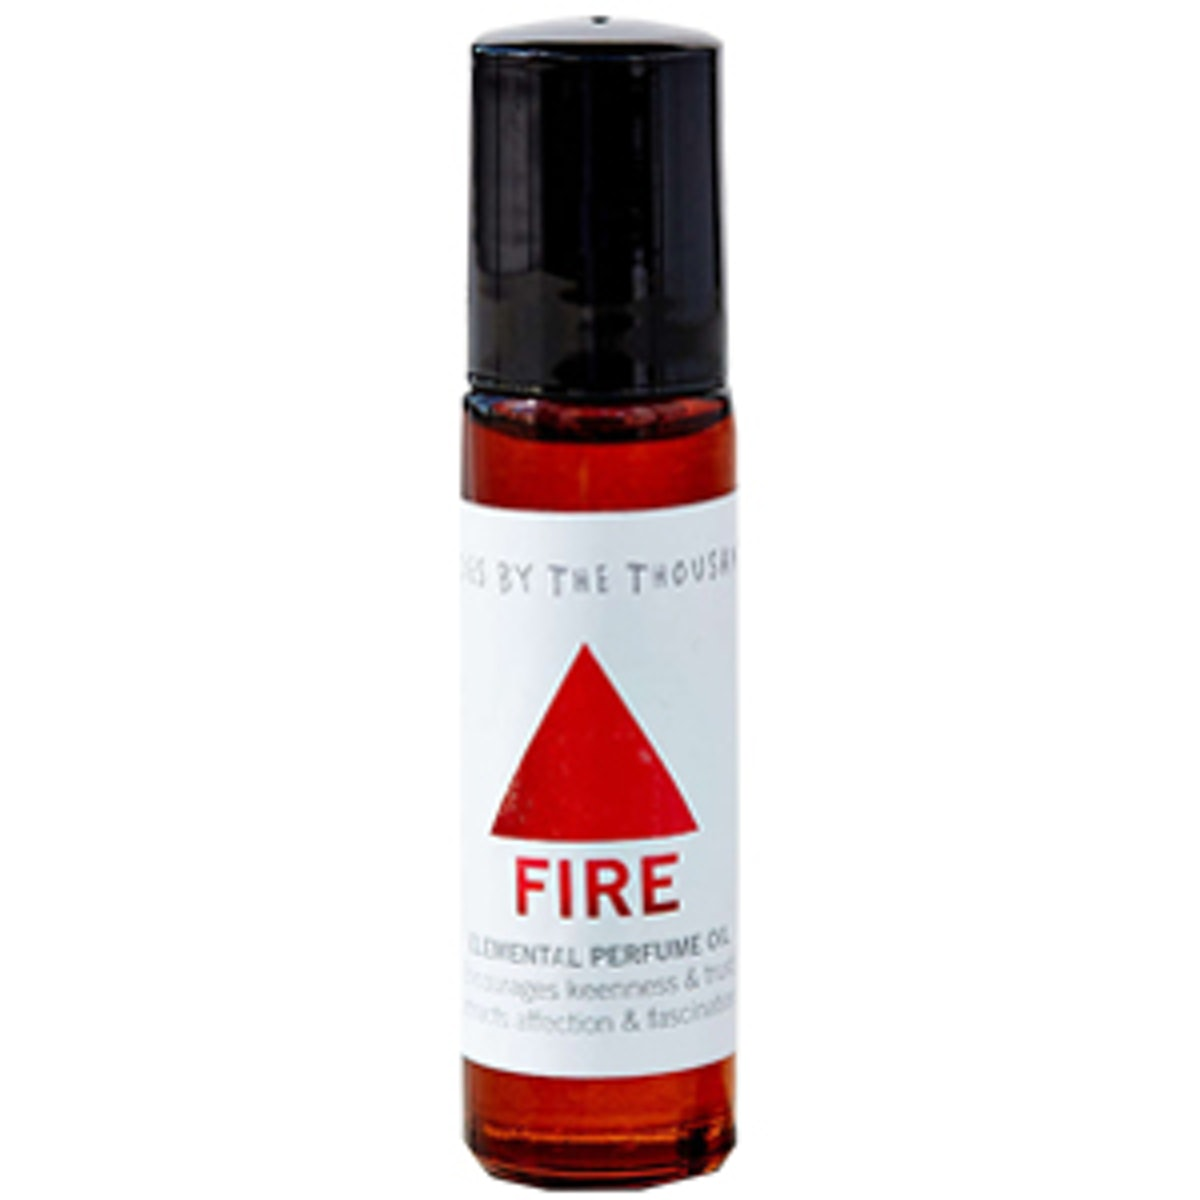 Perfume Oil in Fire